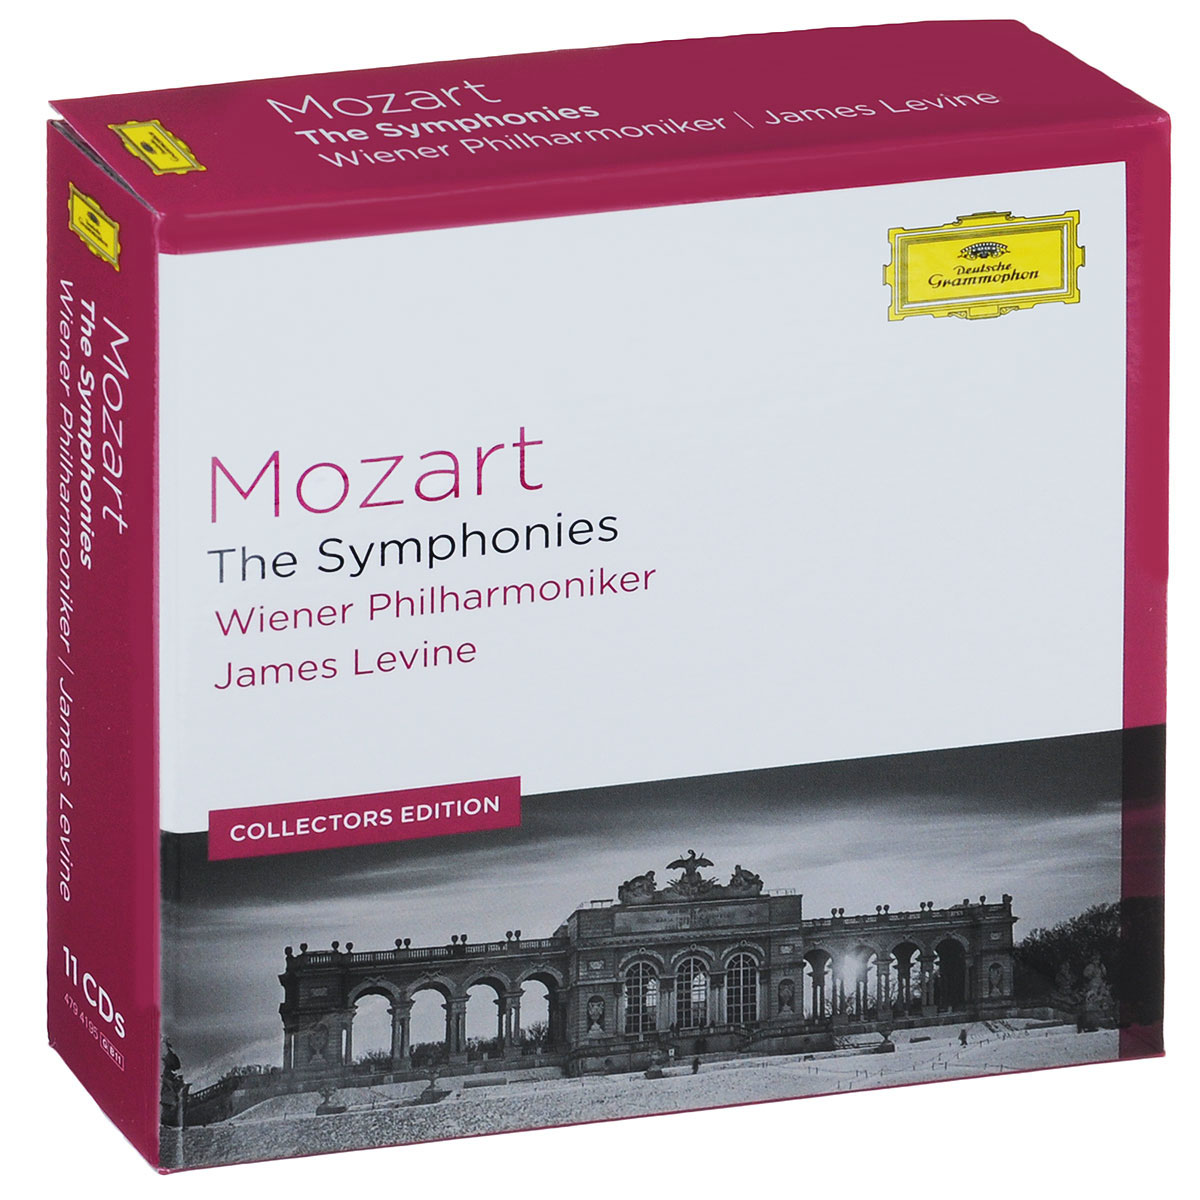 Wiener Philharmoniker James Levine. Wiener Philharmoniker. Mozart. The Symphonies (Collectors Edition) (11 CD) strauss james levine elektra